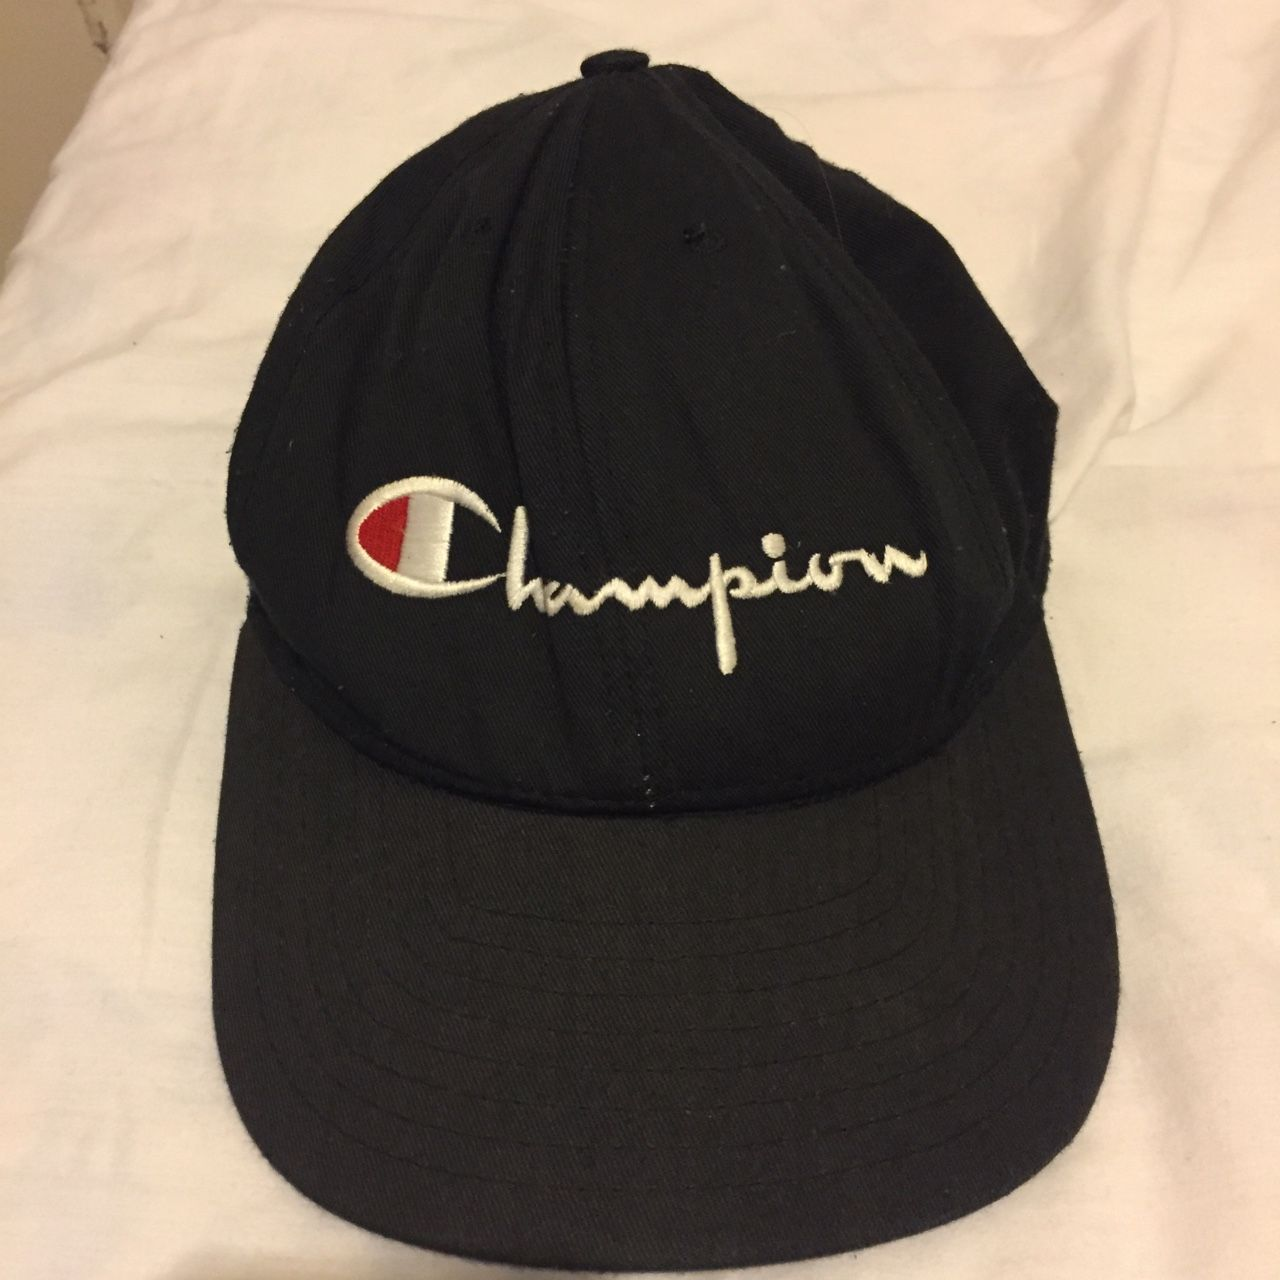 65f904b952b2f Vintage Champion hat with adjustable strap. 8 10 condition  champion